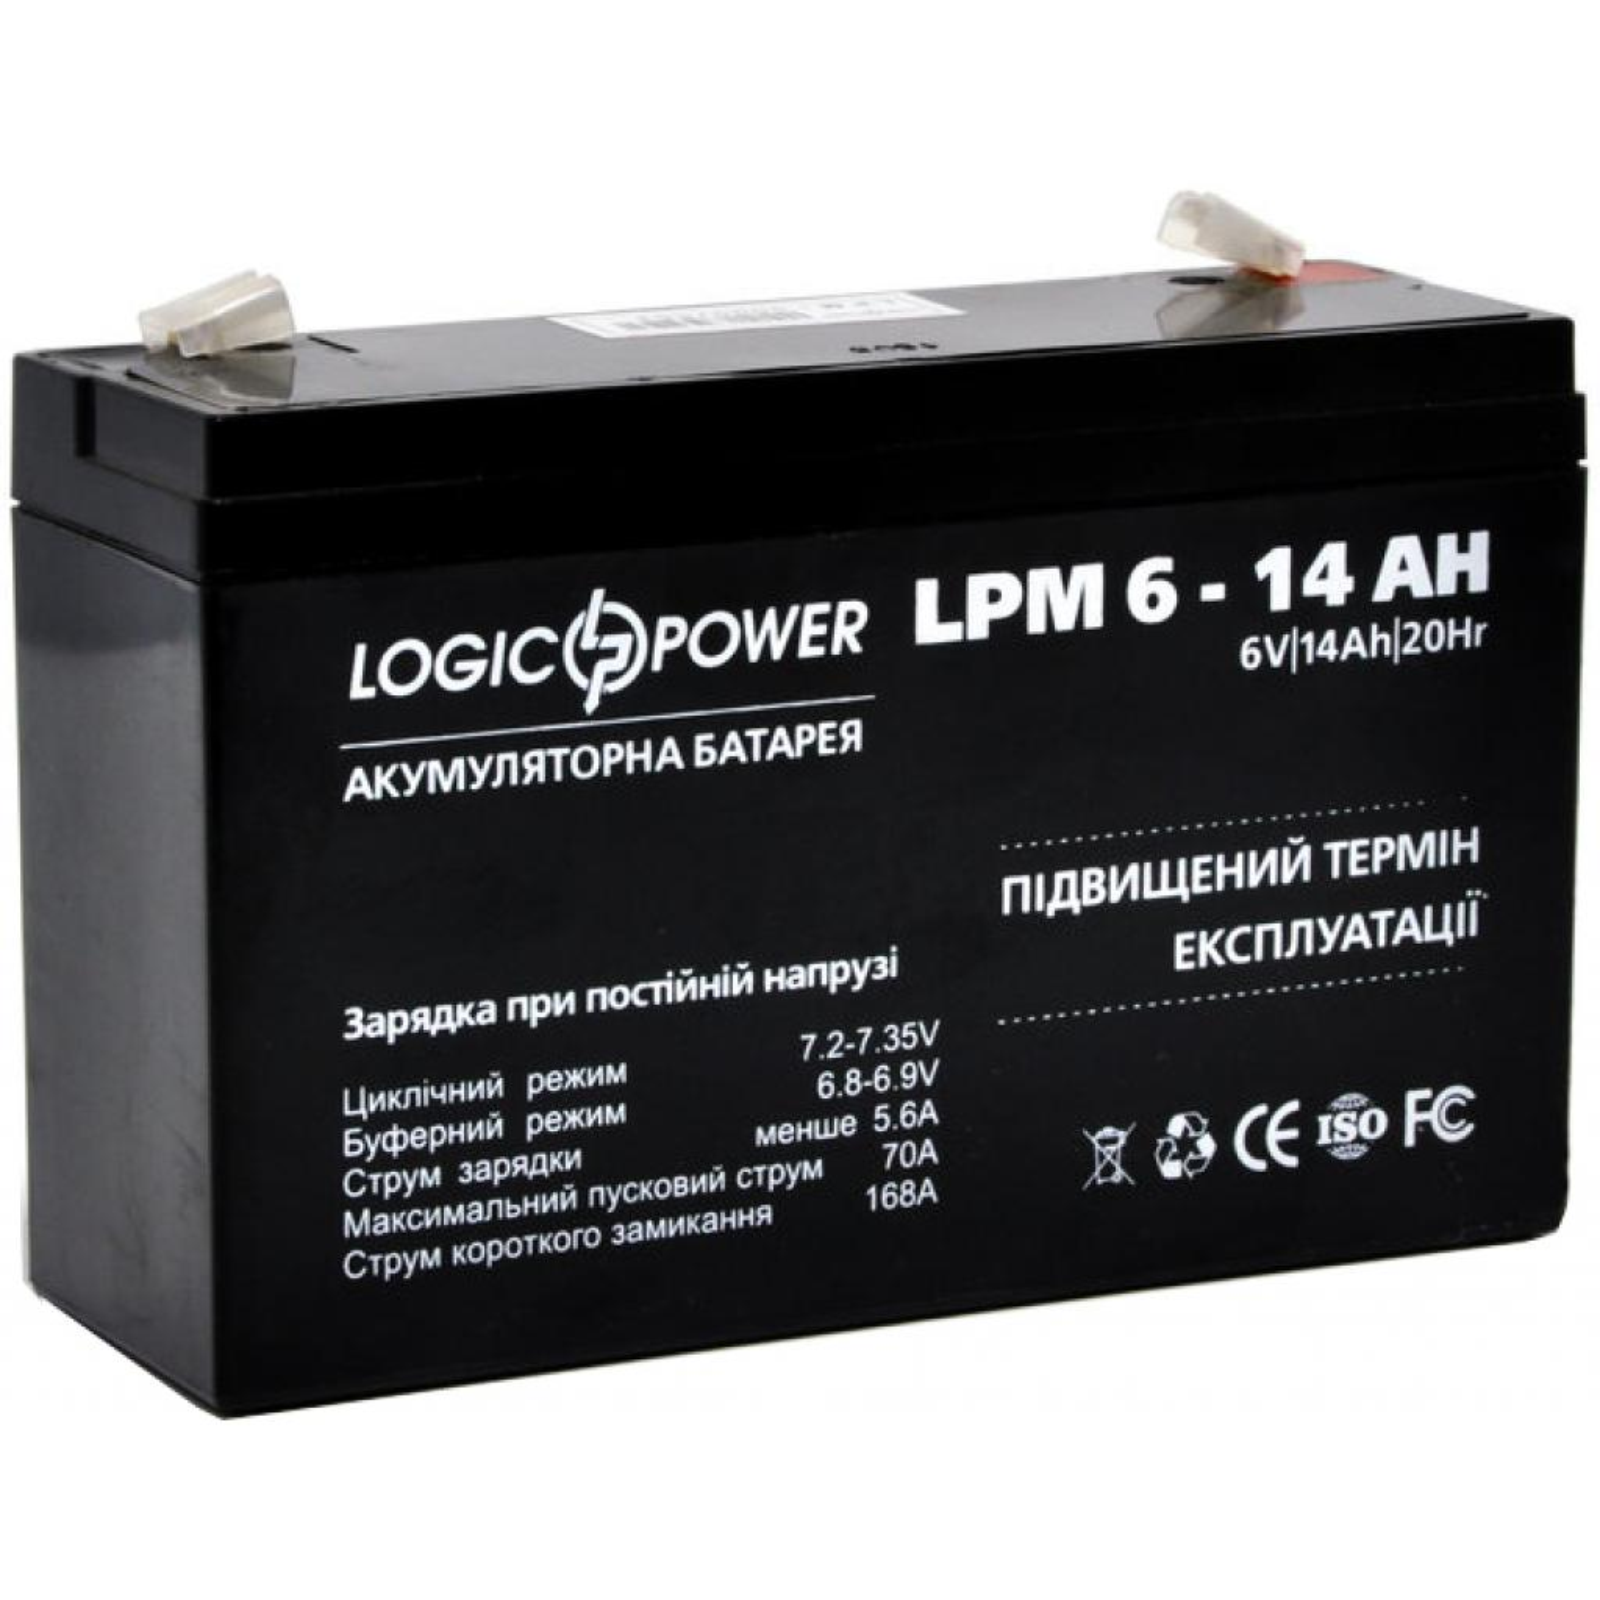 Батарея к ИБП LogicPower LPM 6В 14 Ач (4160) изображение 2